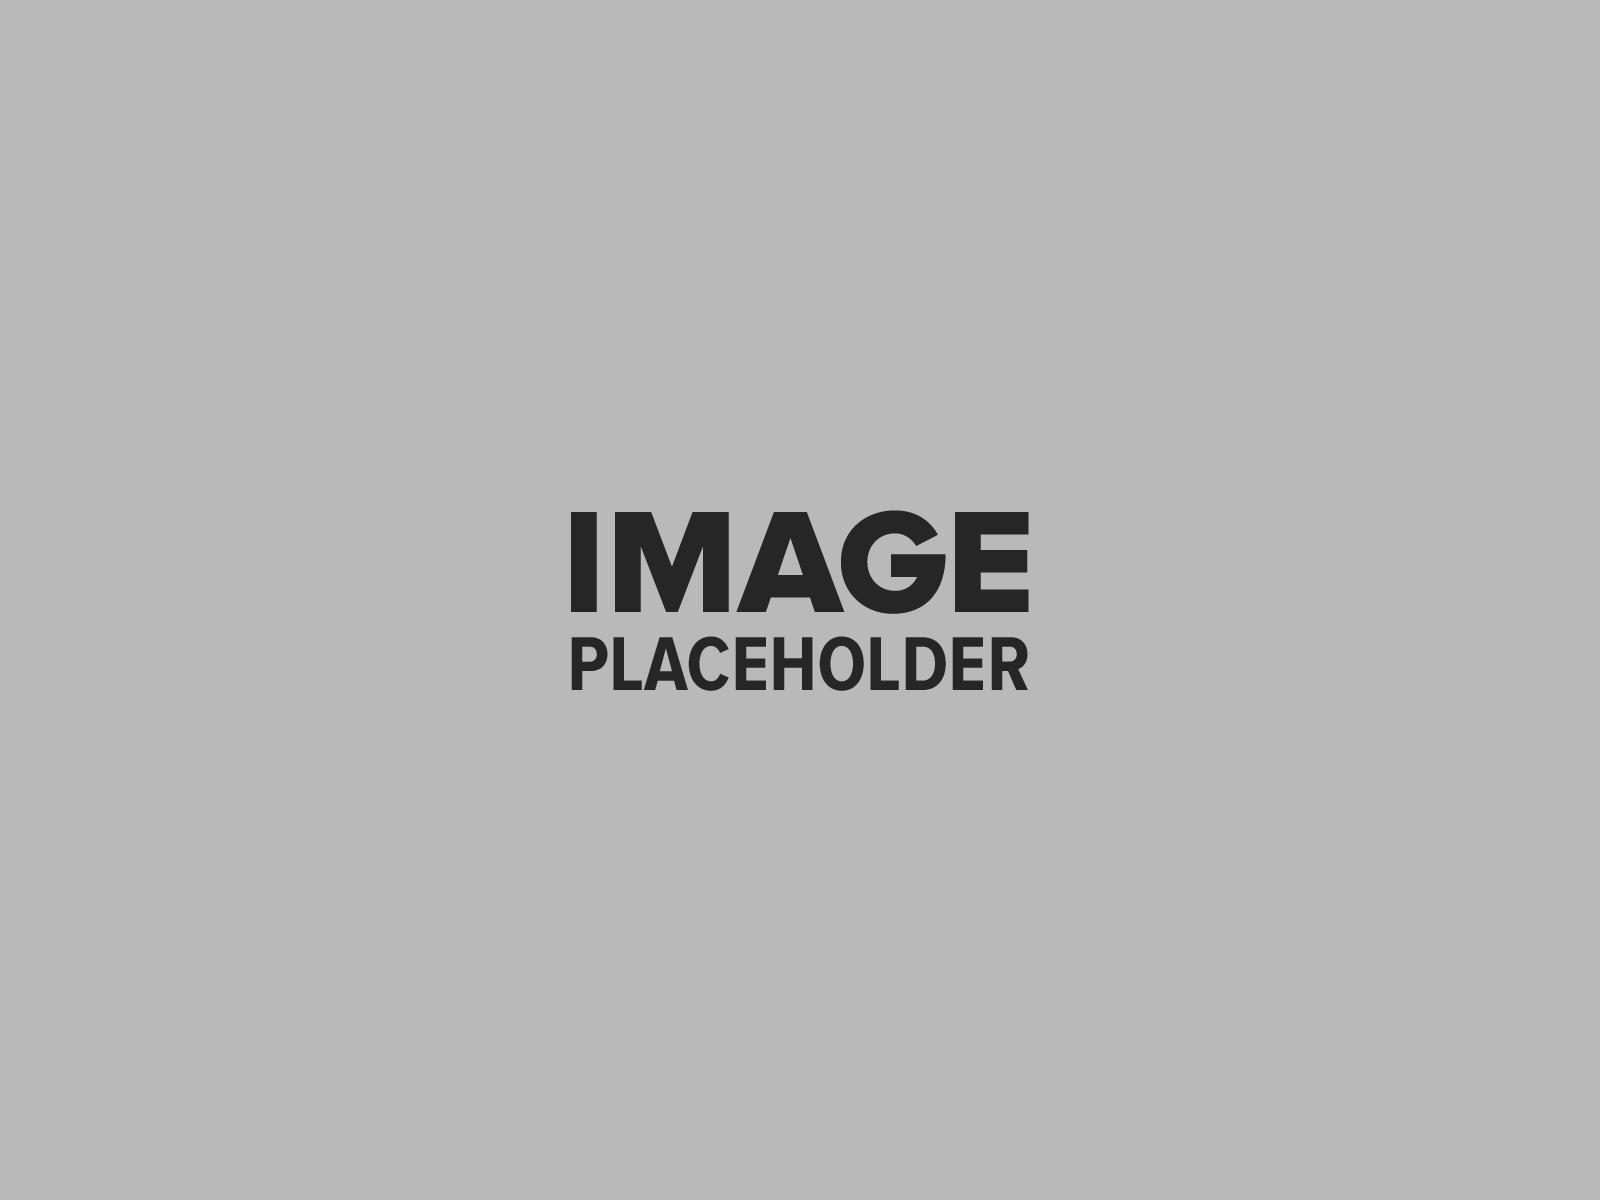 pojo-placeholder-5